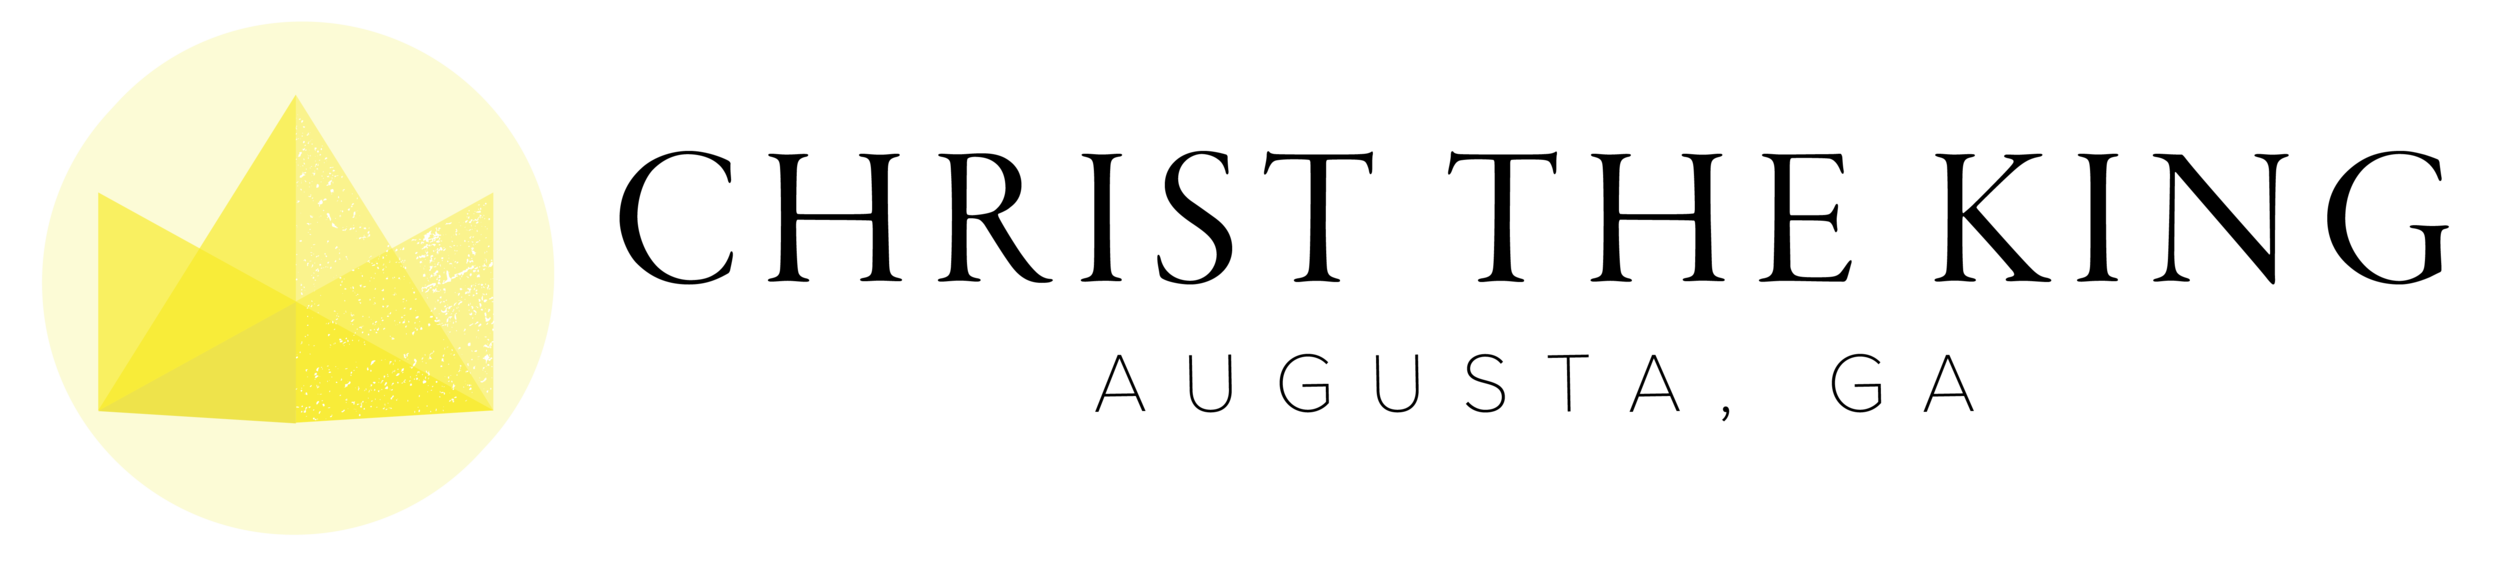 new crown logo text transparent.png